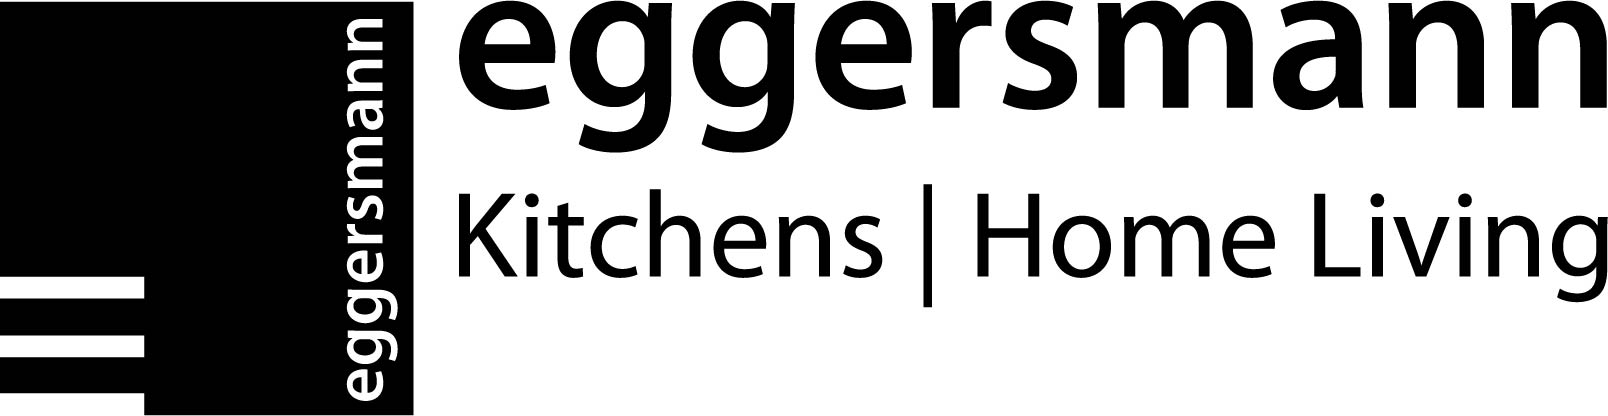 2020 Home Tour - Eggersmann logo